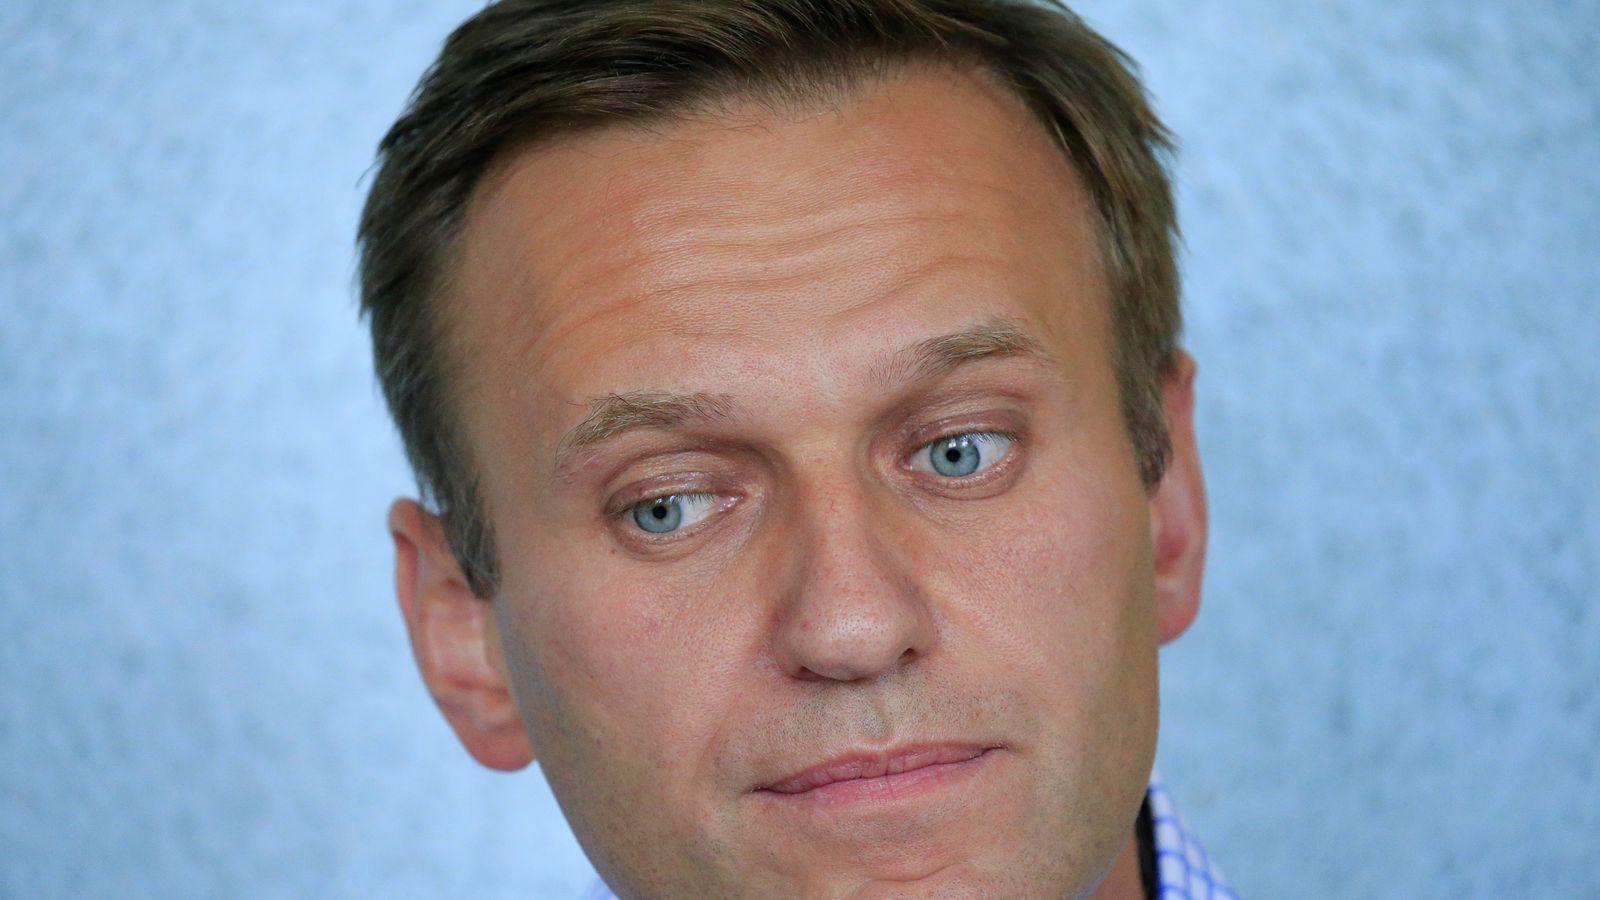 Alexei Navalny: Poisoned Putin critic faces jail on return ...